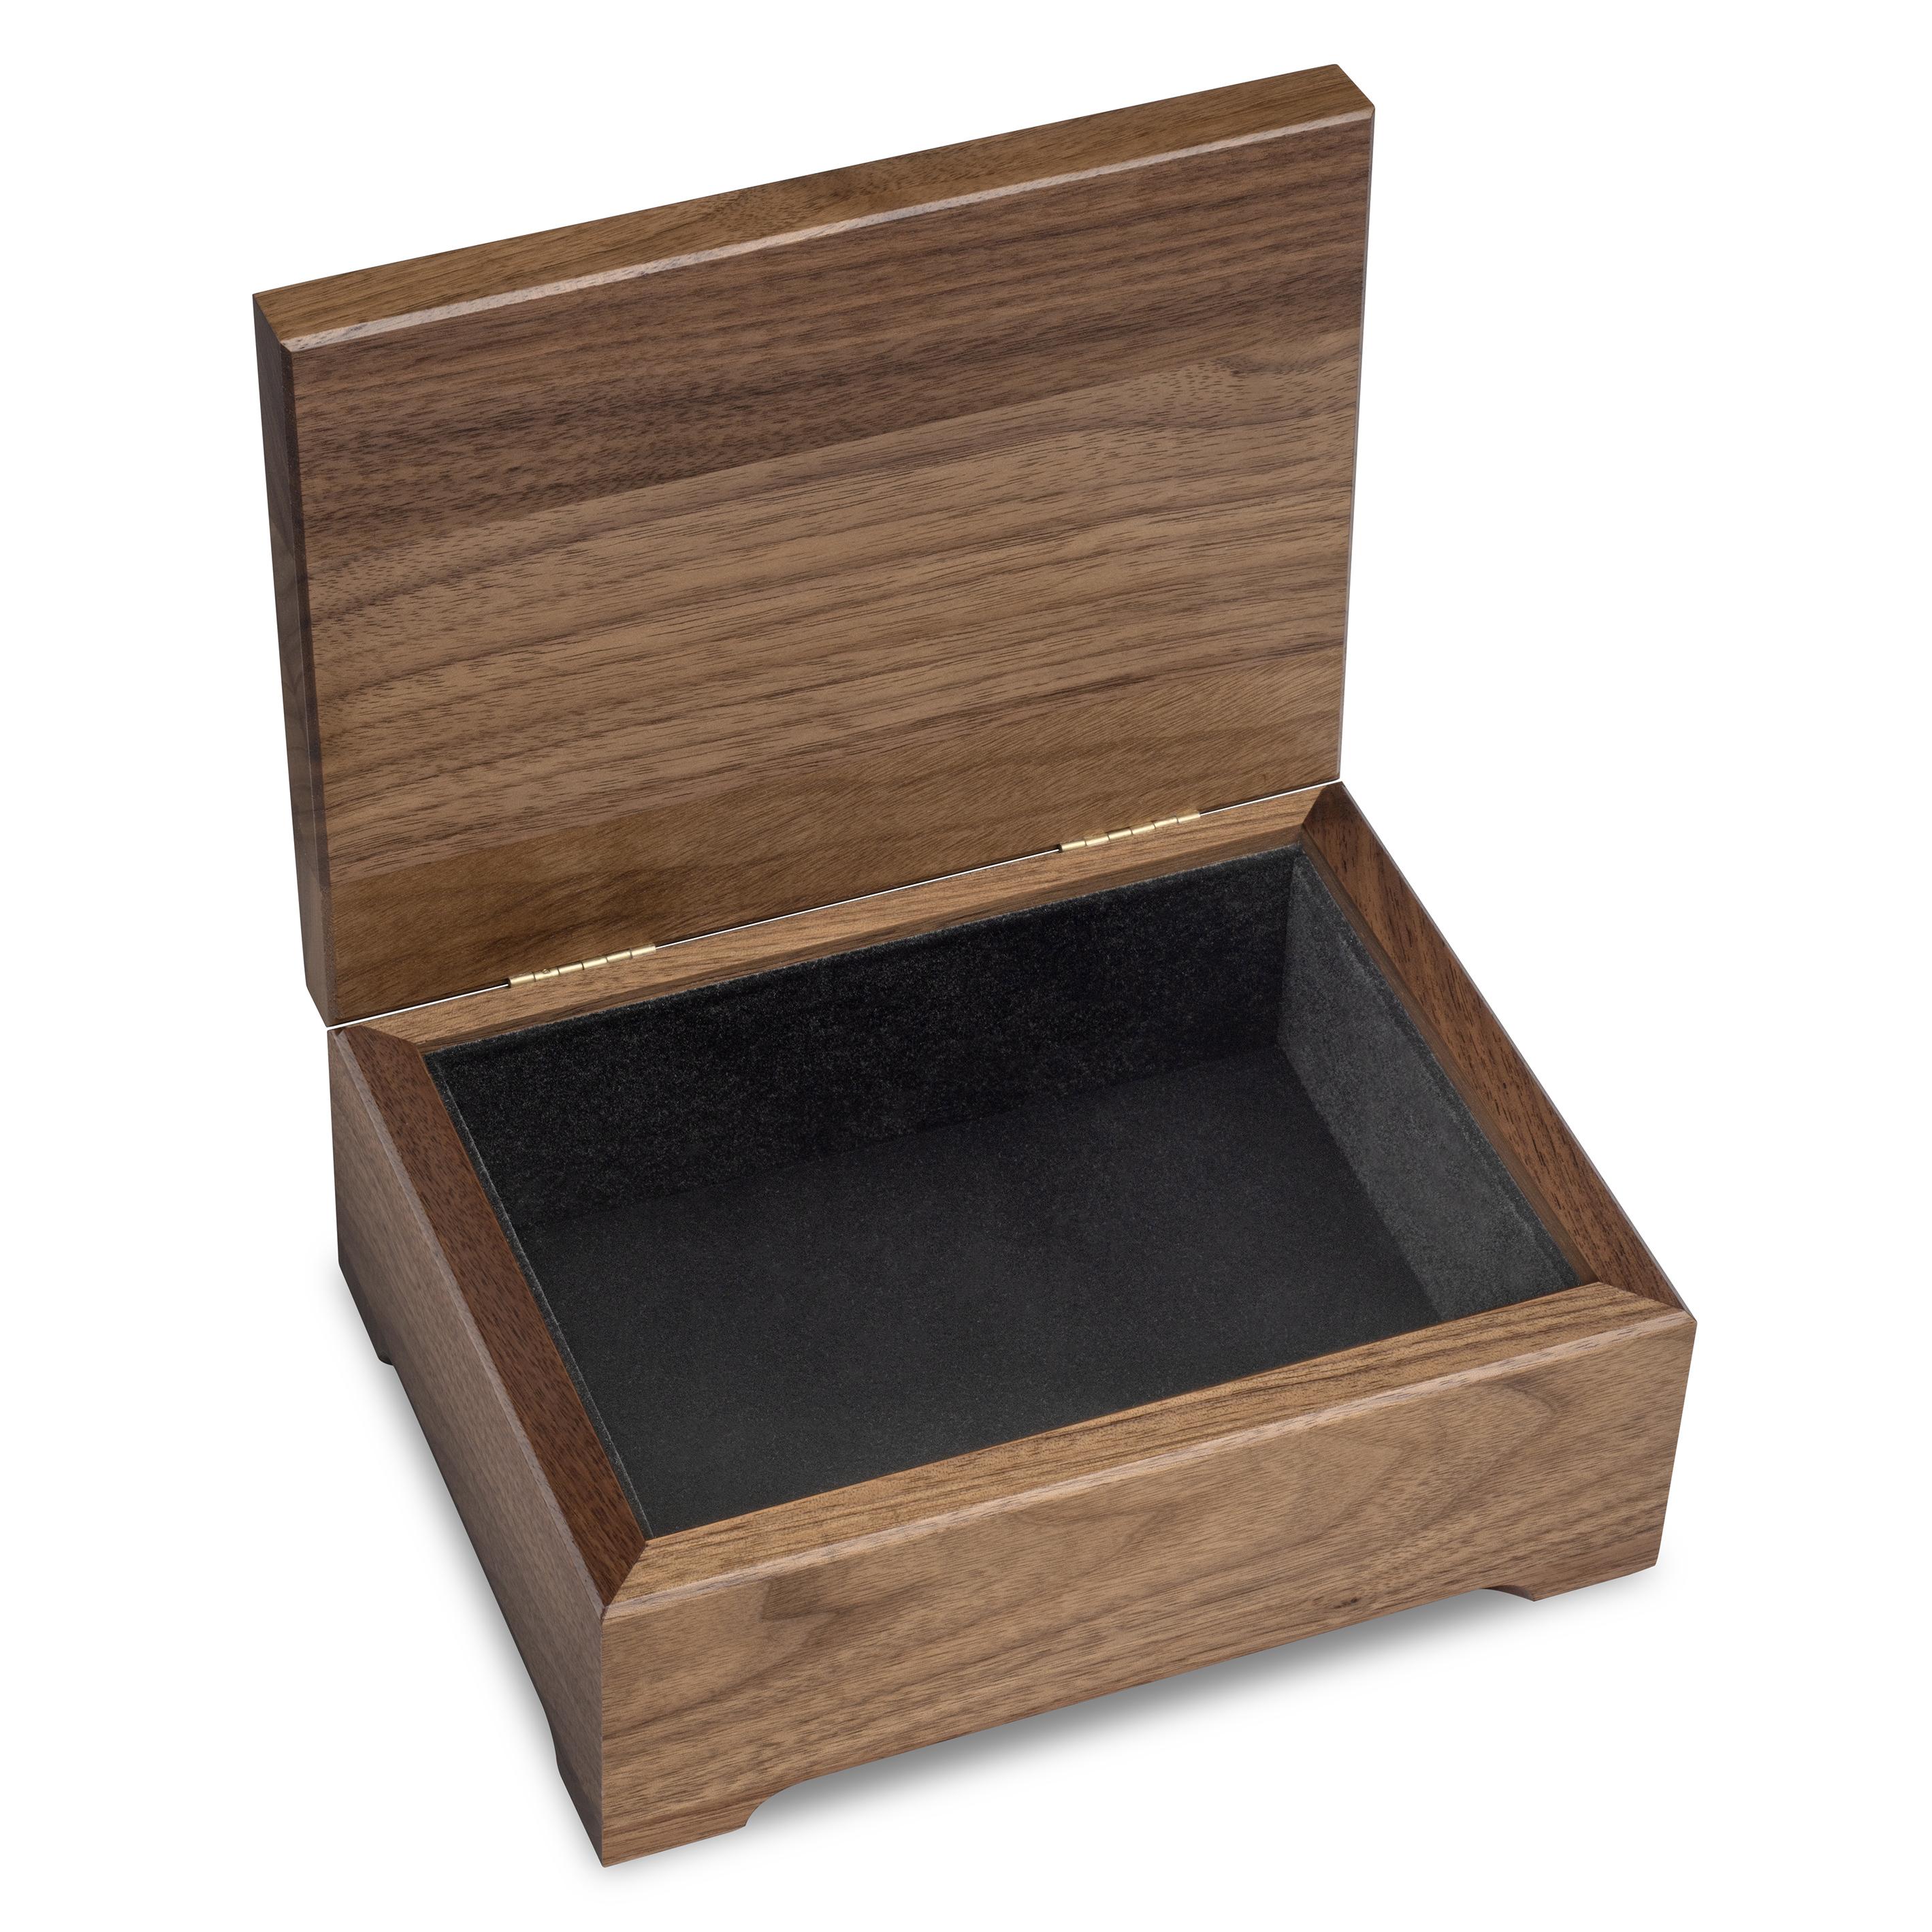 College of Charleston Solid Walnut Desk Box - Image 2